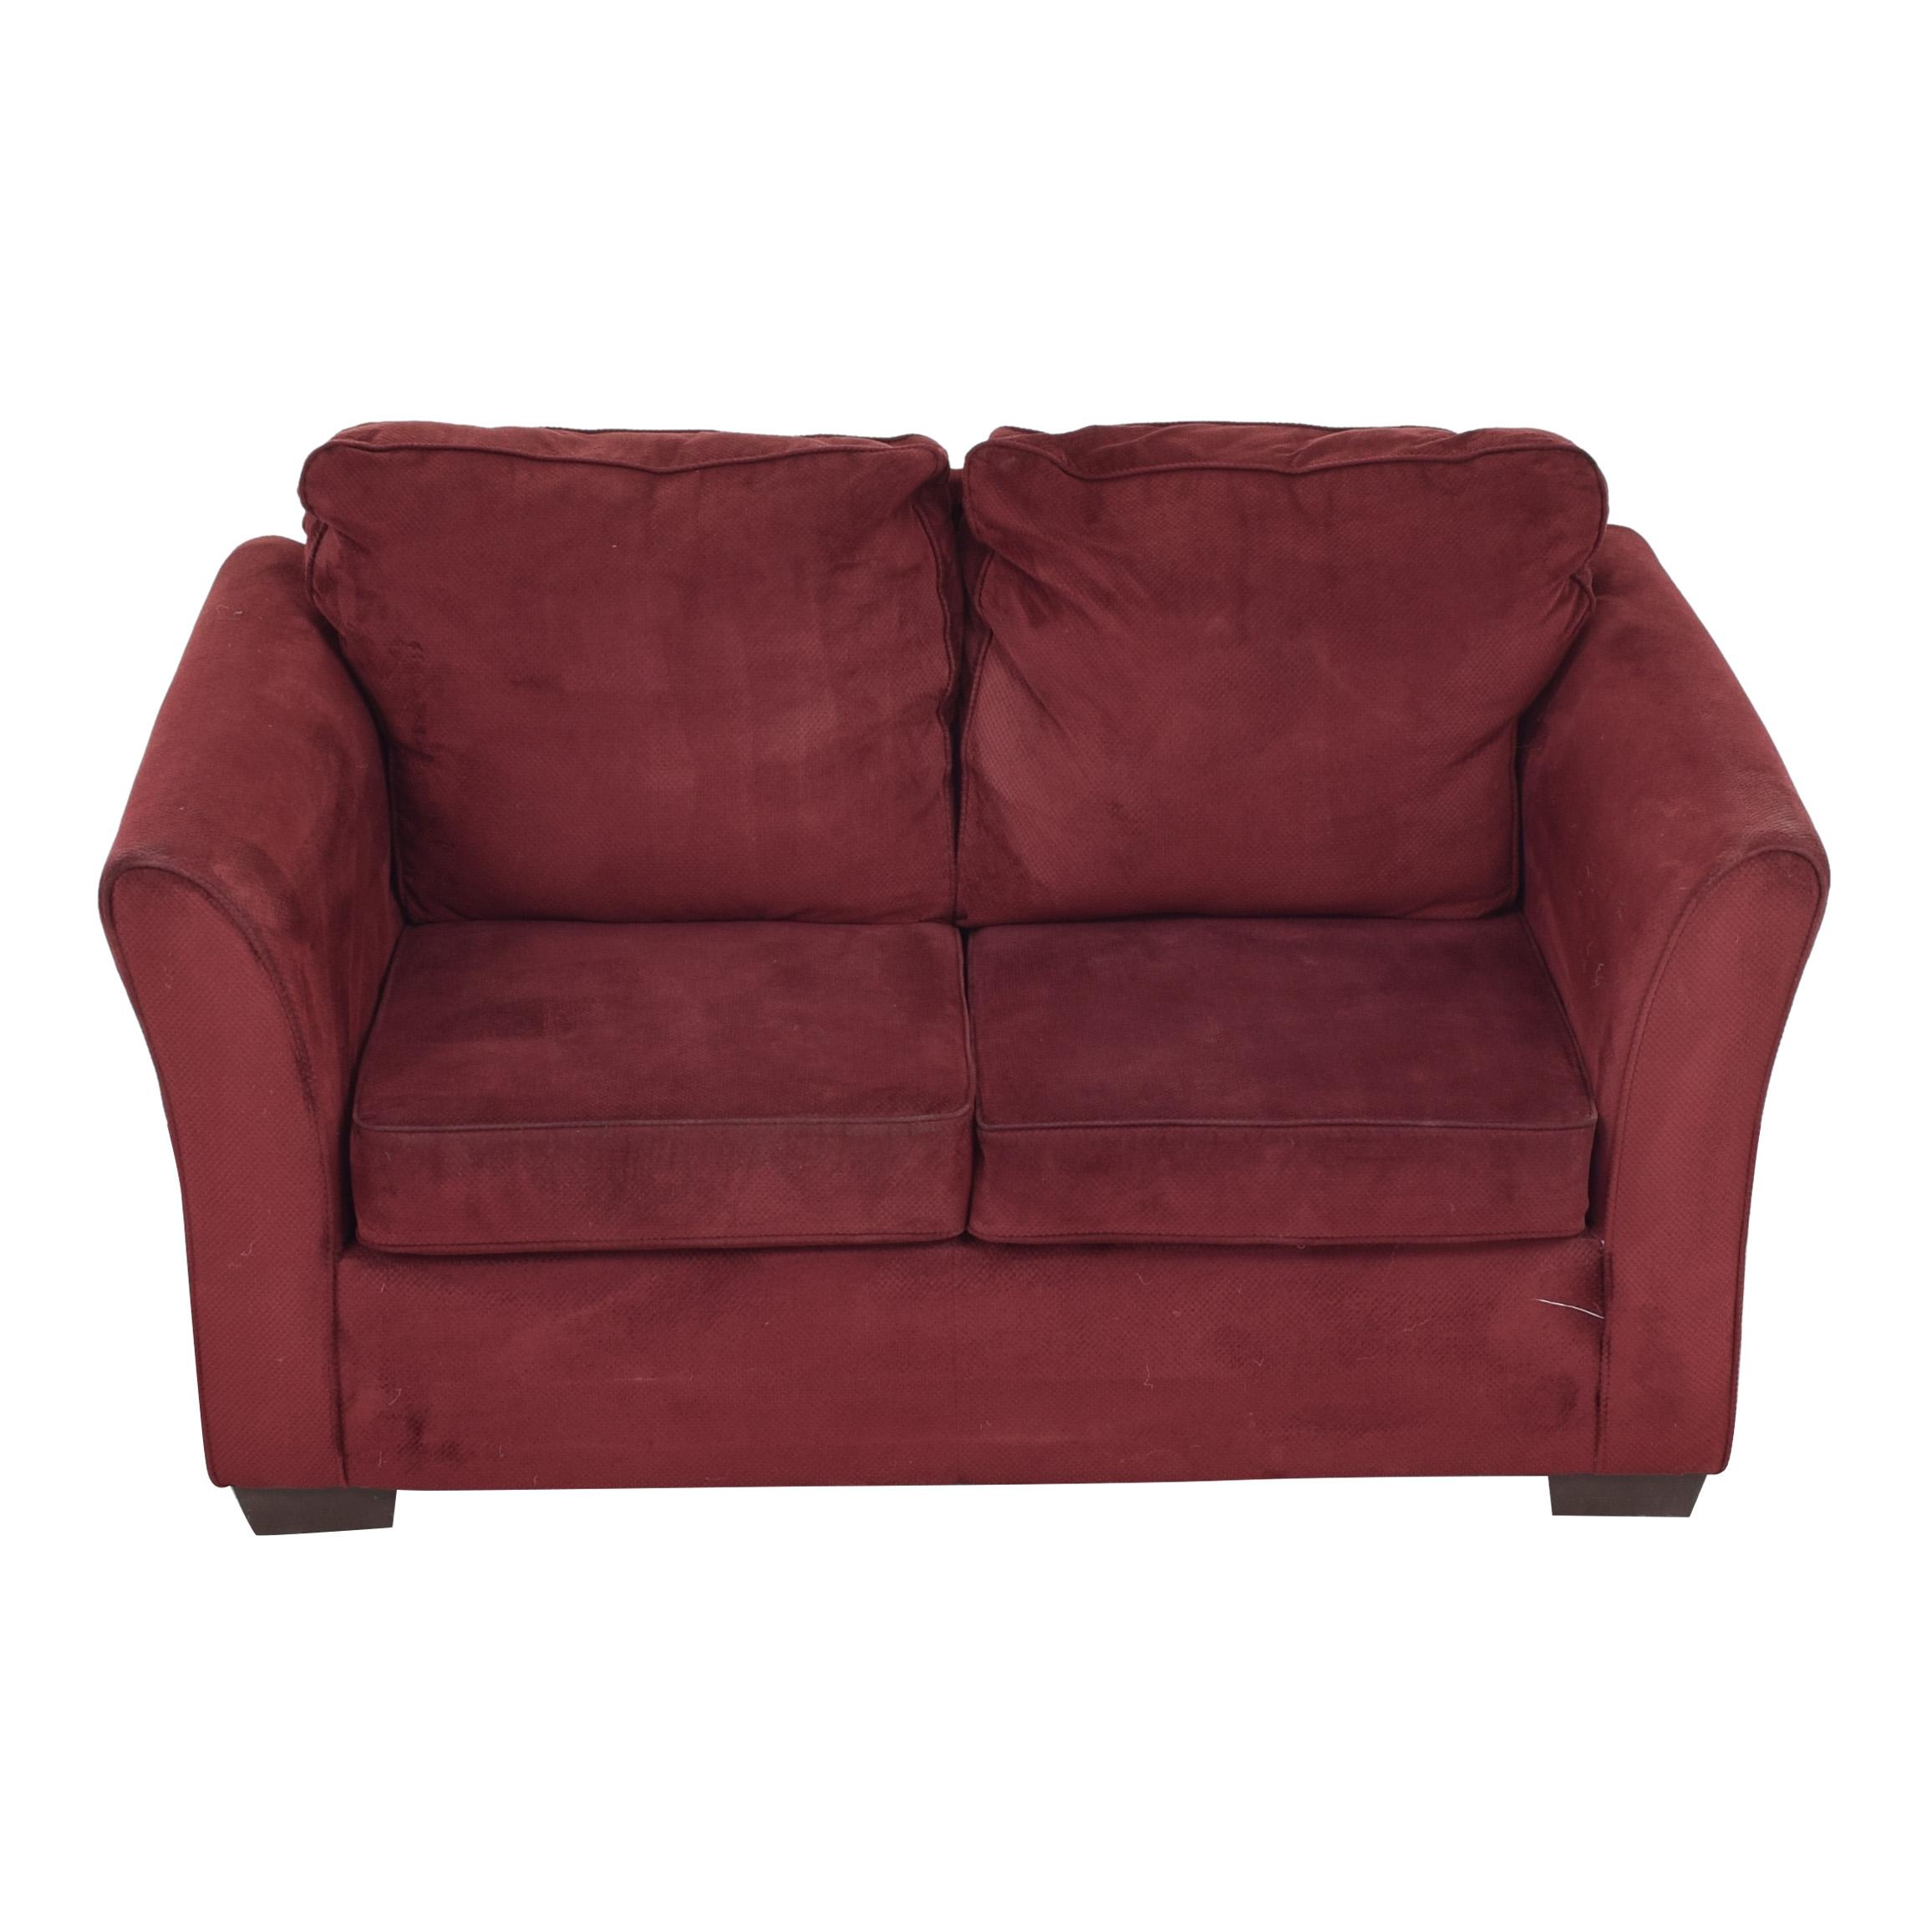 buy United Furniture by Simmons Malibu Wine Loves United Furniture